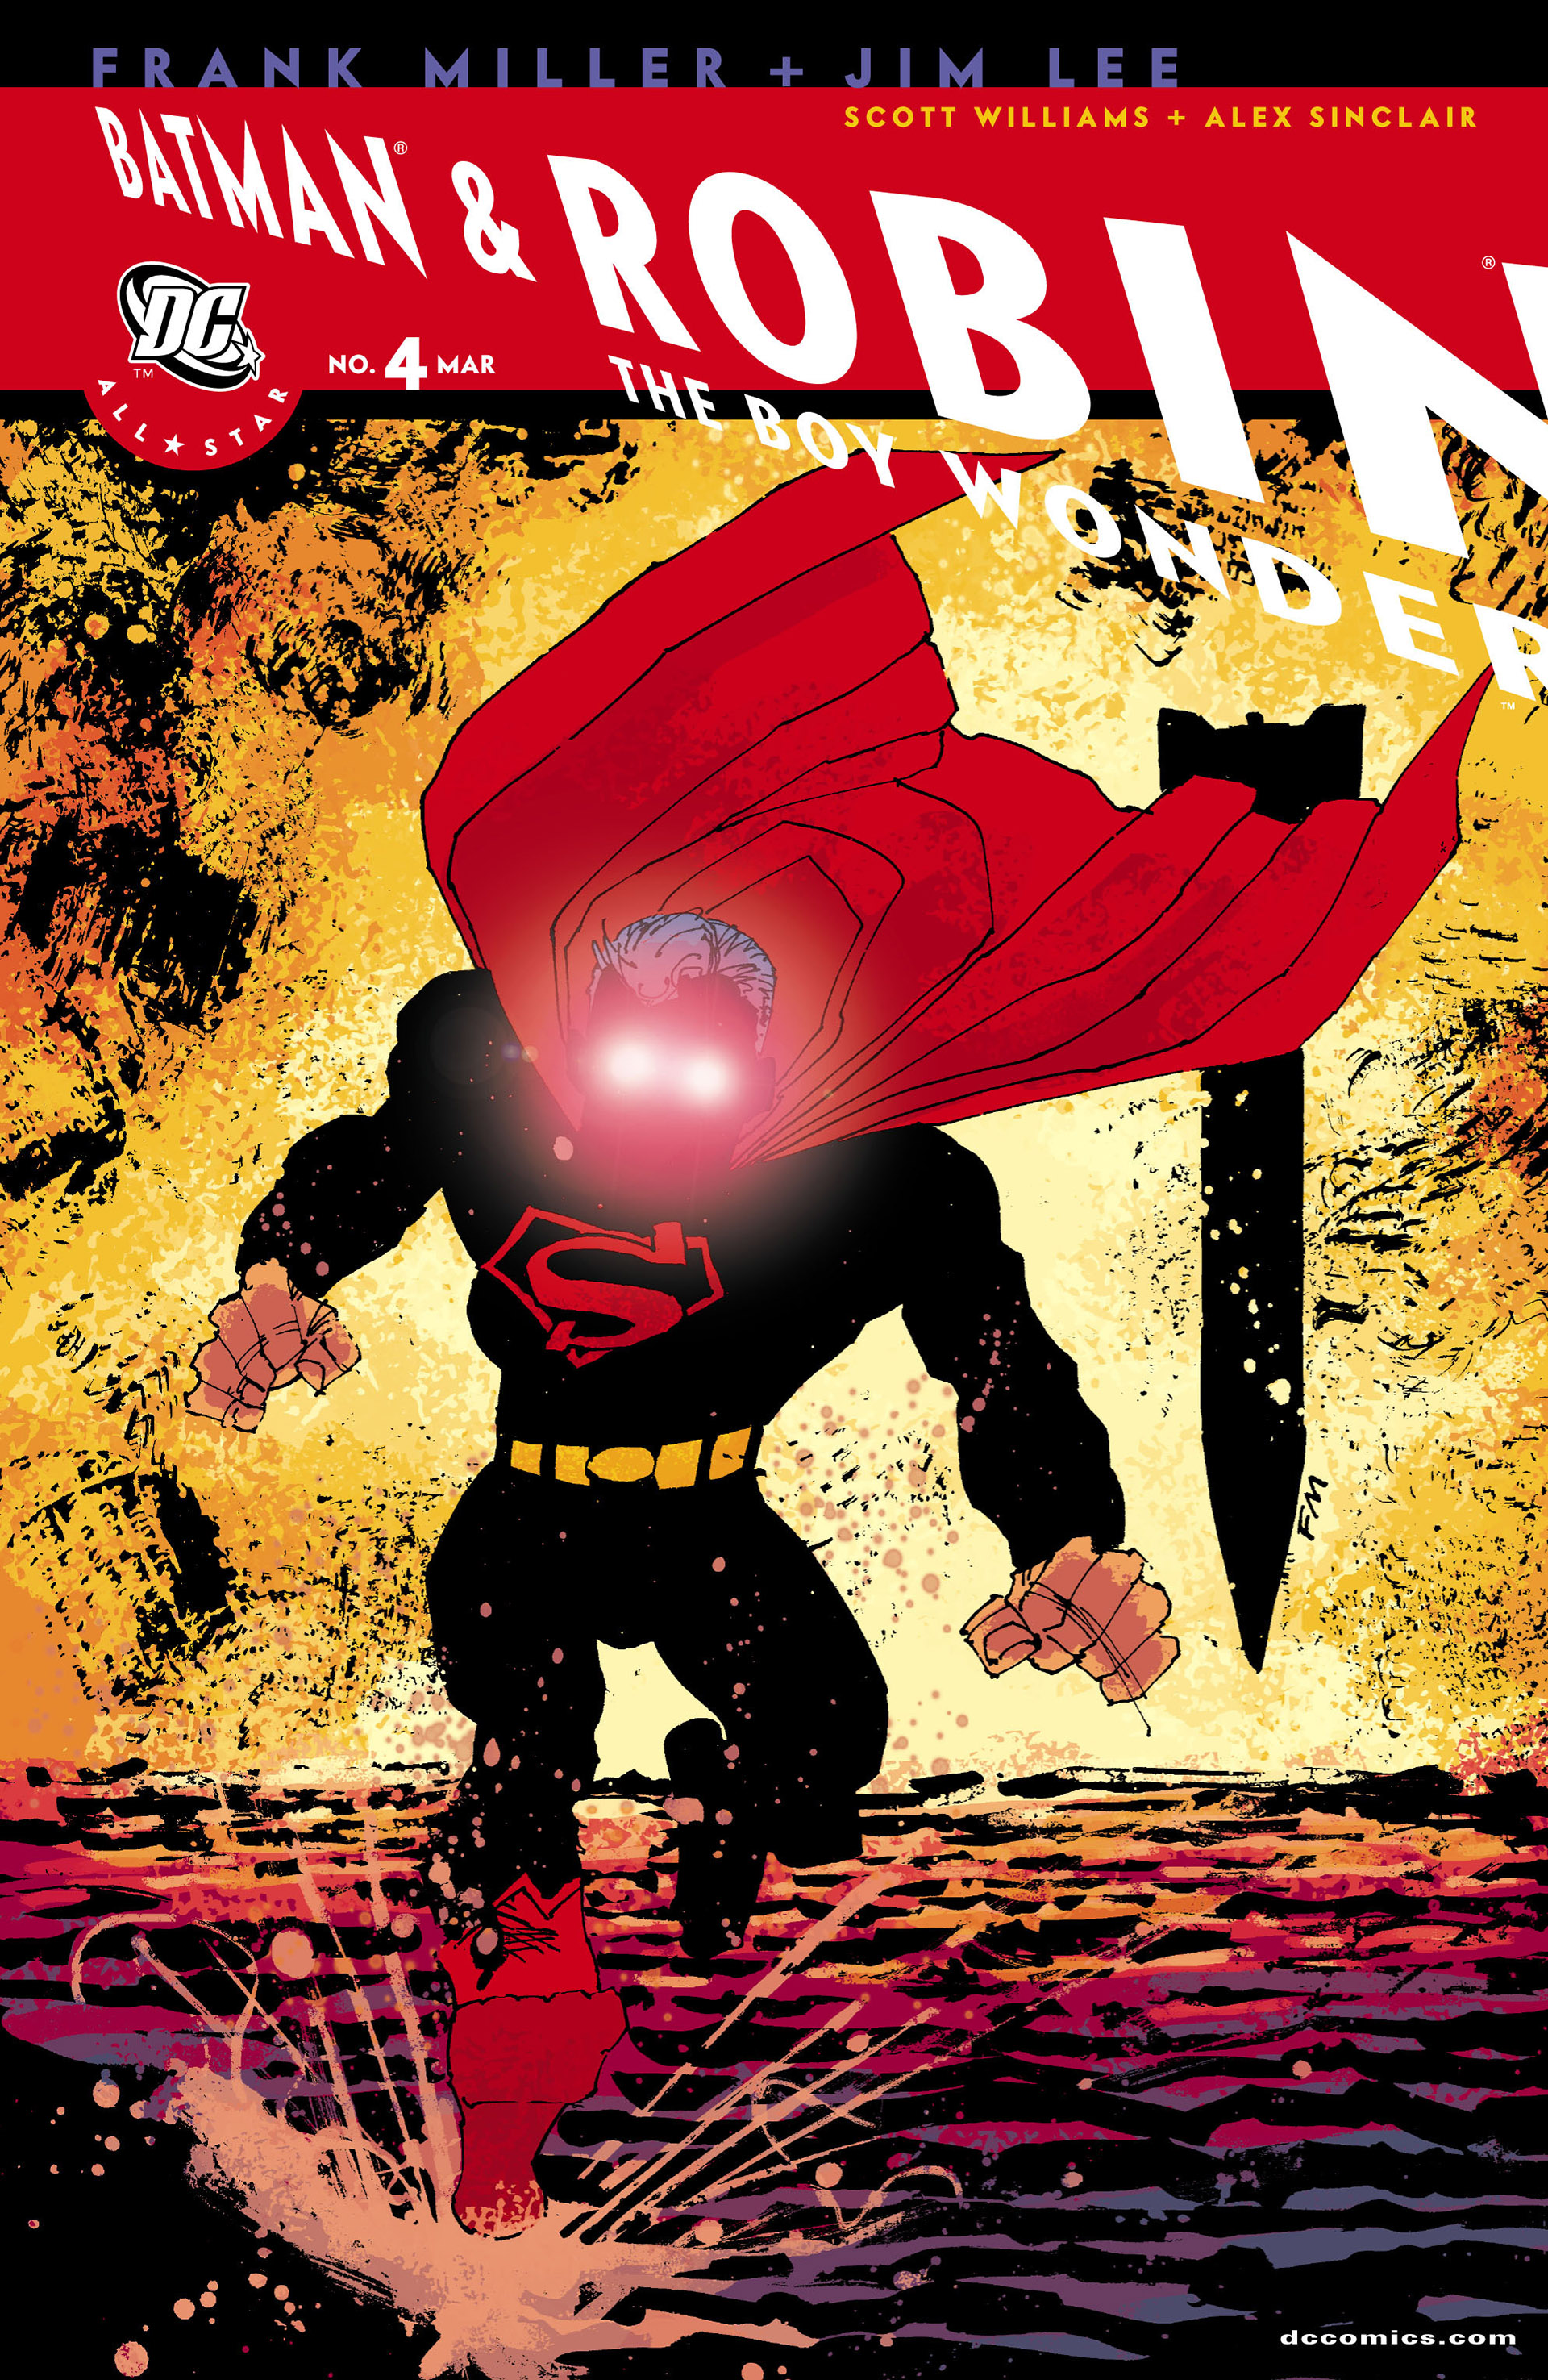 Read online All Star Batman & Robin, The Boy Wonder comic -  Issue #4 - 2